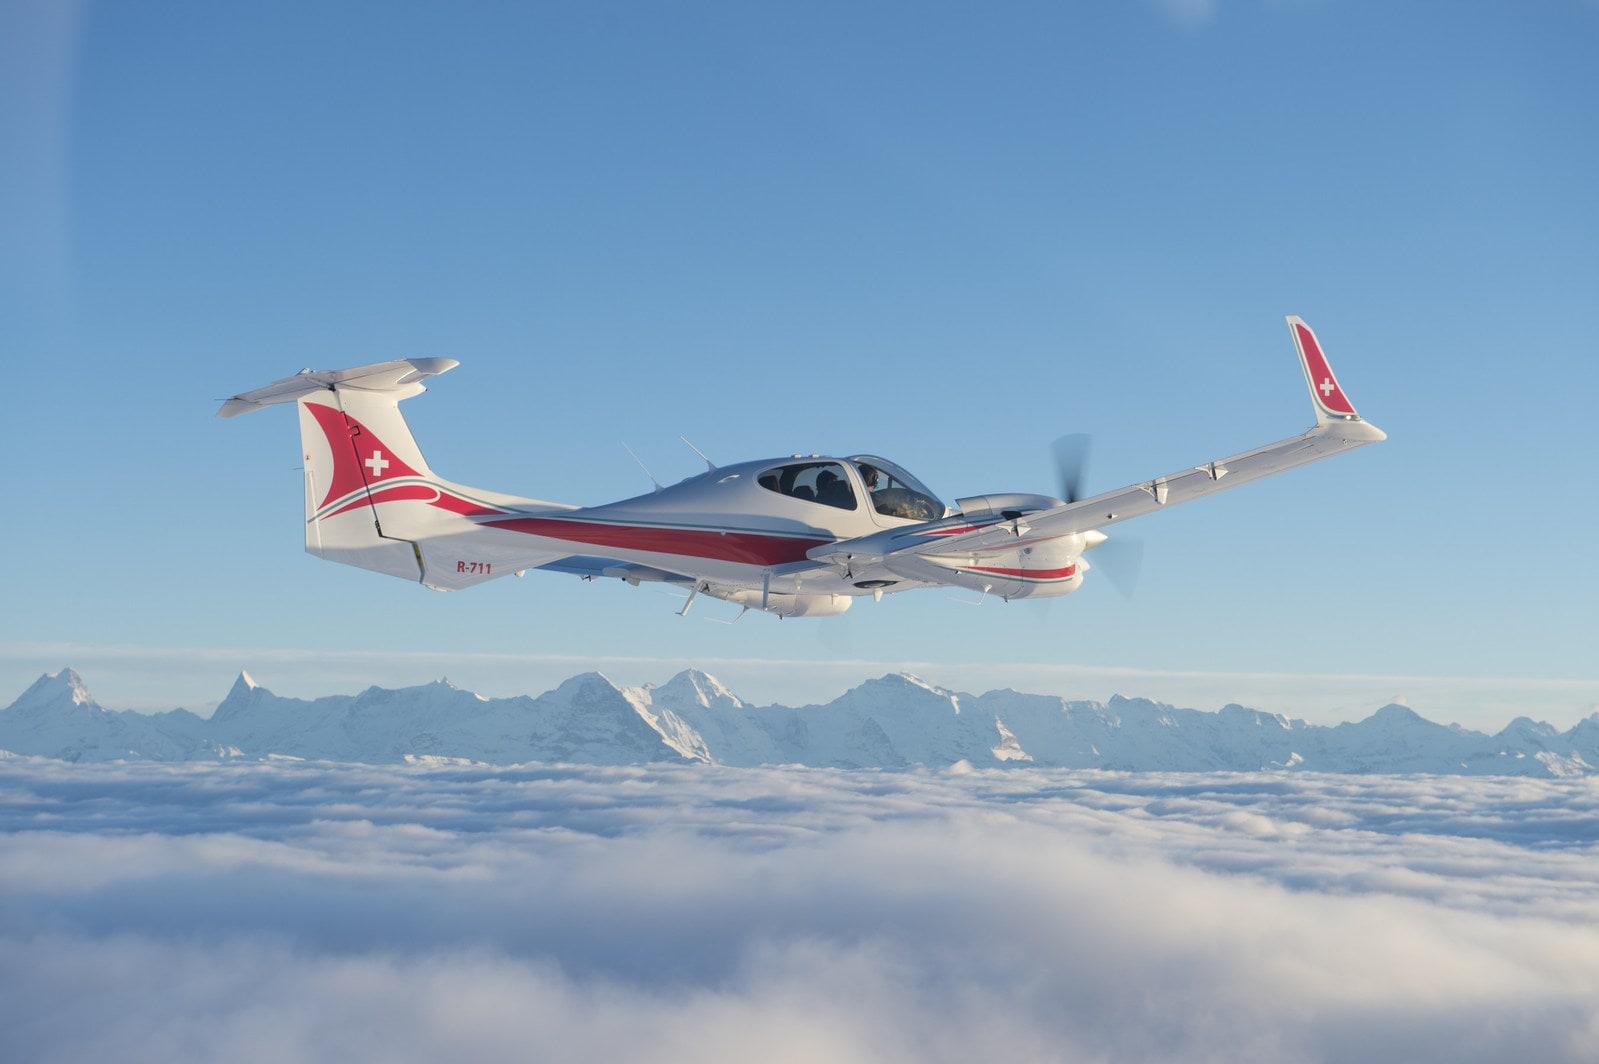 Aurora's Centaur Optionally-Piloted Aircraft (OPA)